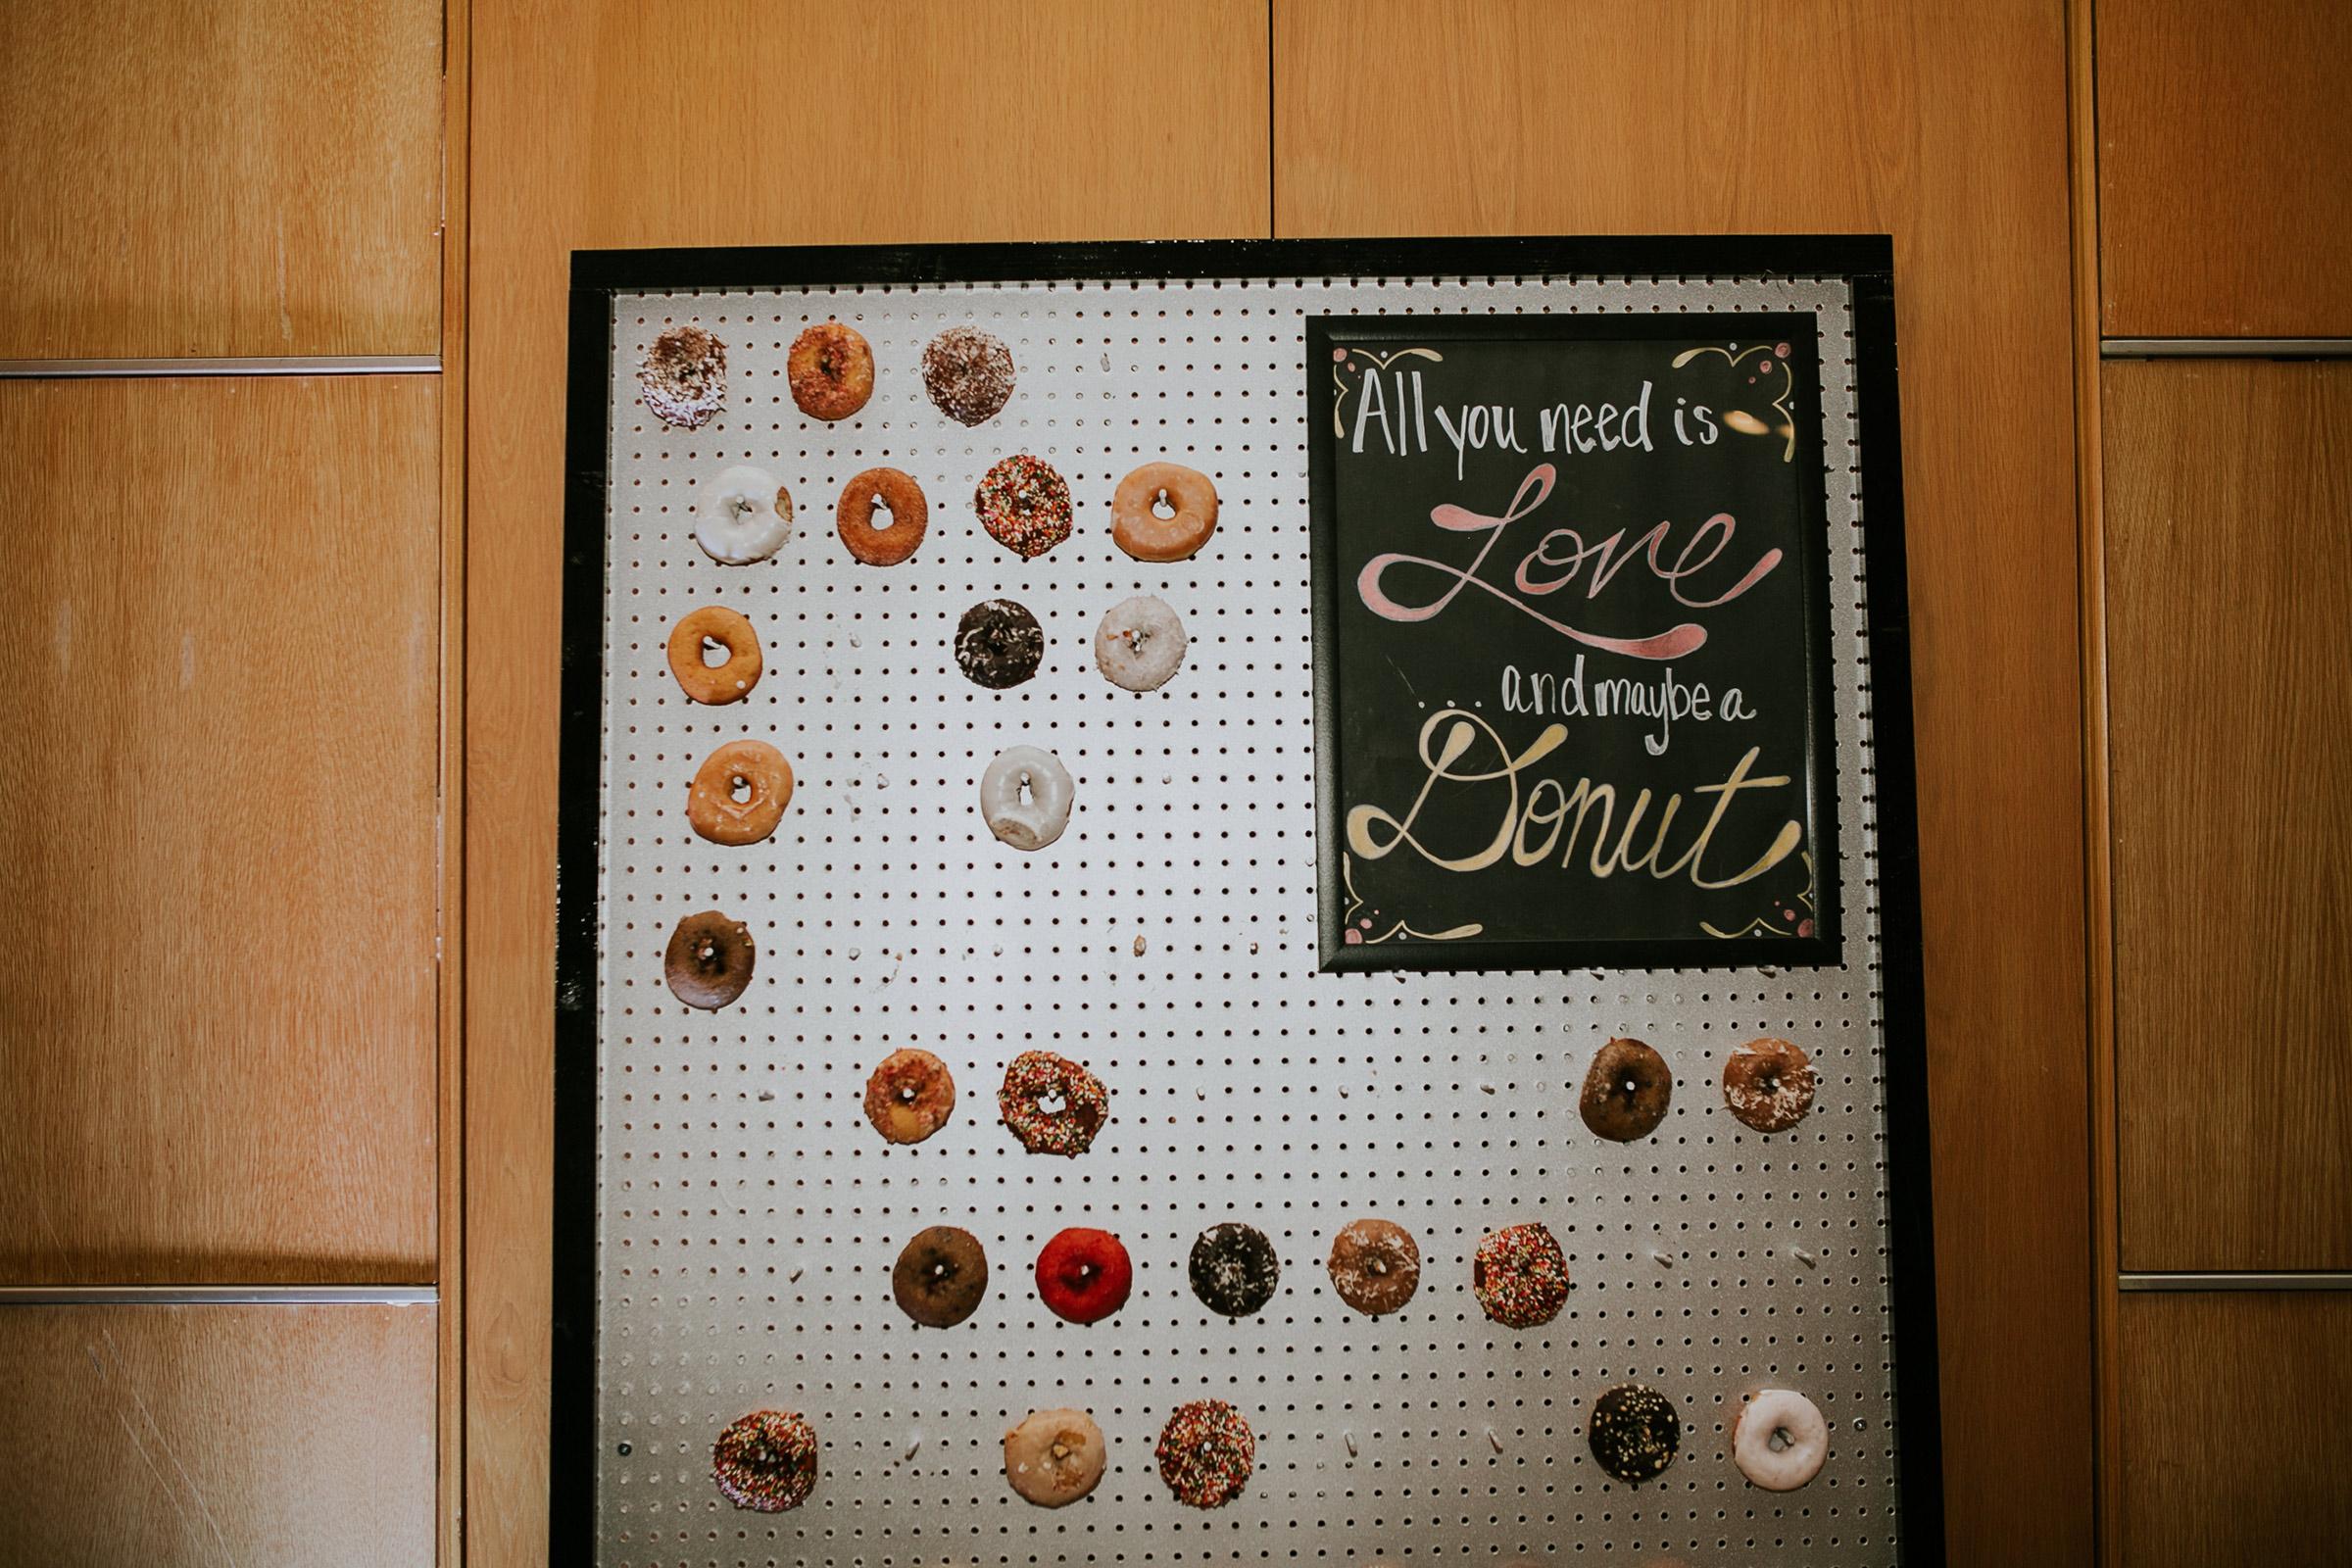 donut-display-desmoines-iowa-art-center-raelyn-ramey-photography.jpg